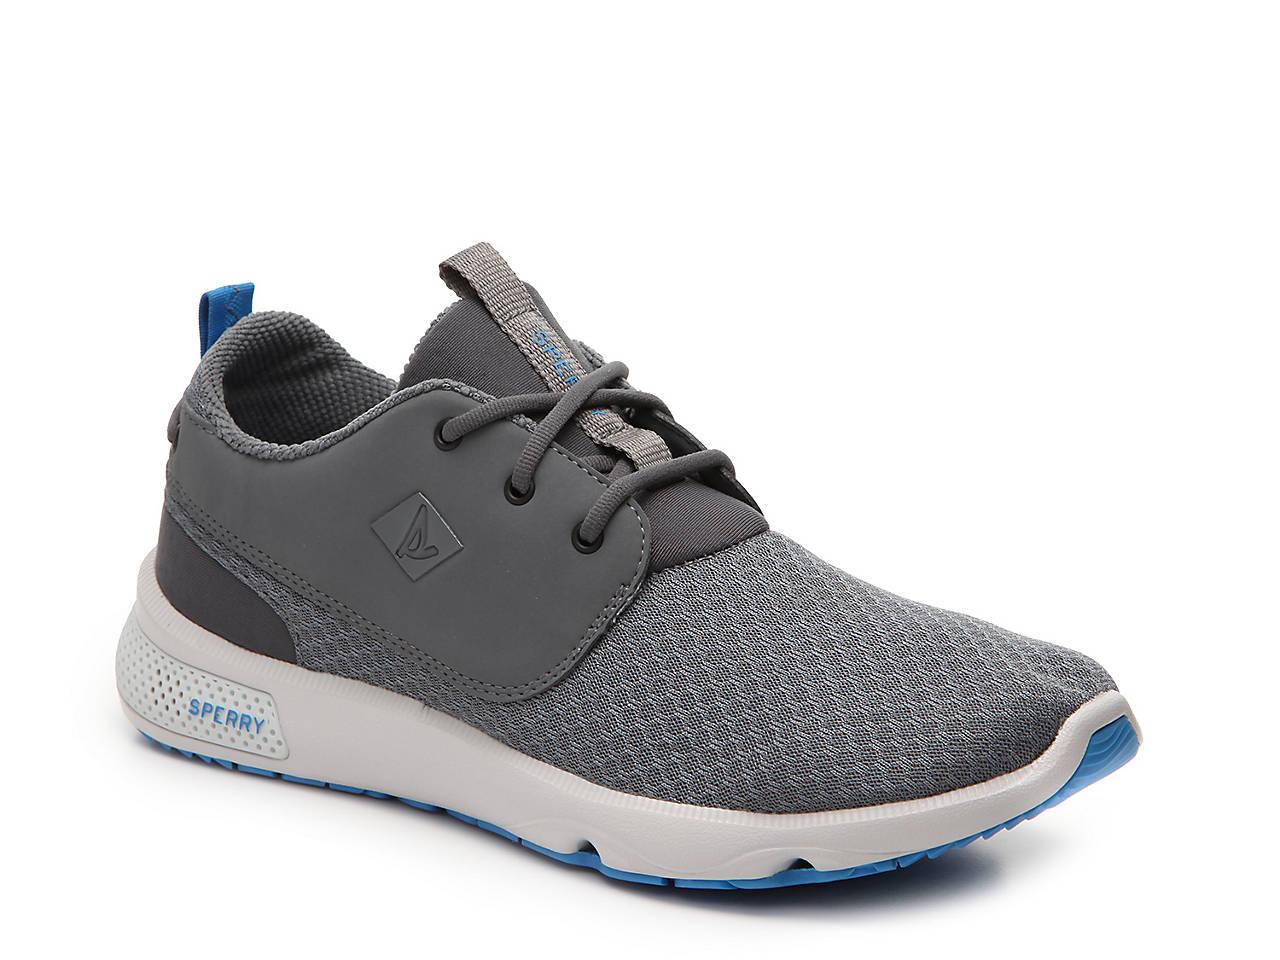 0e63916b9348 Sperry Top-Sider Fathom Sneaker Men s Shoes